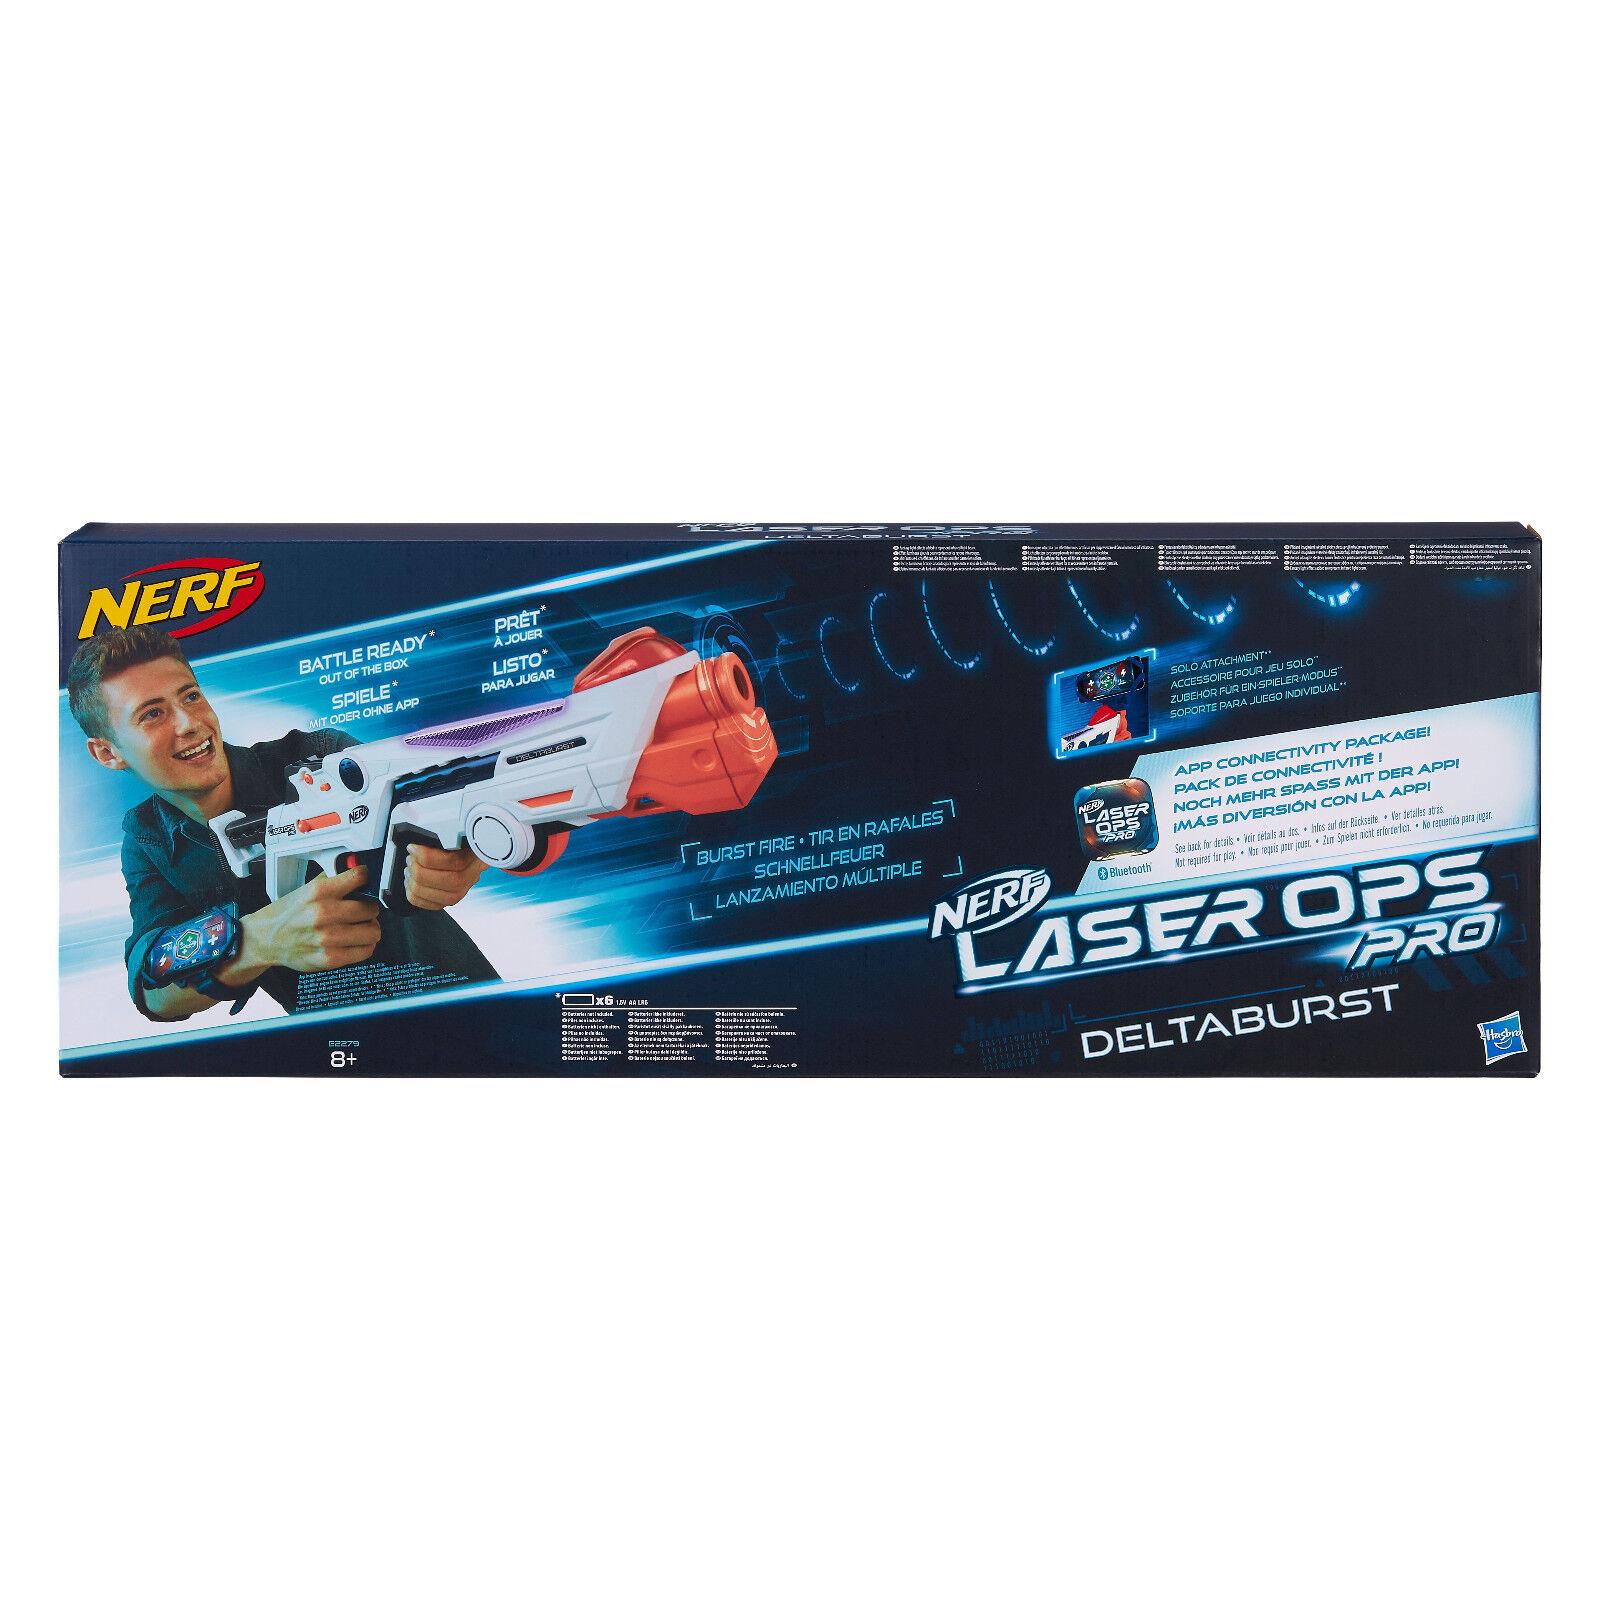 NERF E2279 - LASER OPS PRO DELTABURST, NEU/OVP